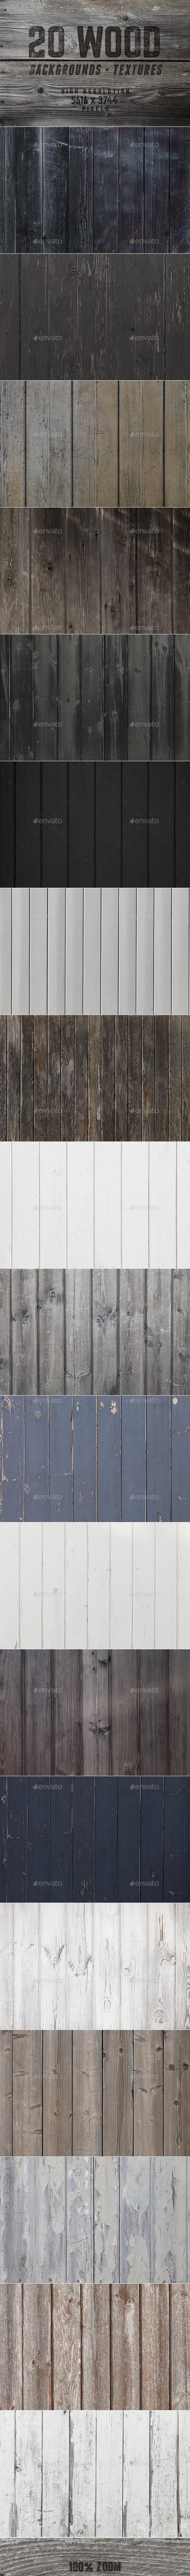 20 Beautiful Wood Backgrounds / Textures - Wood Textures